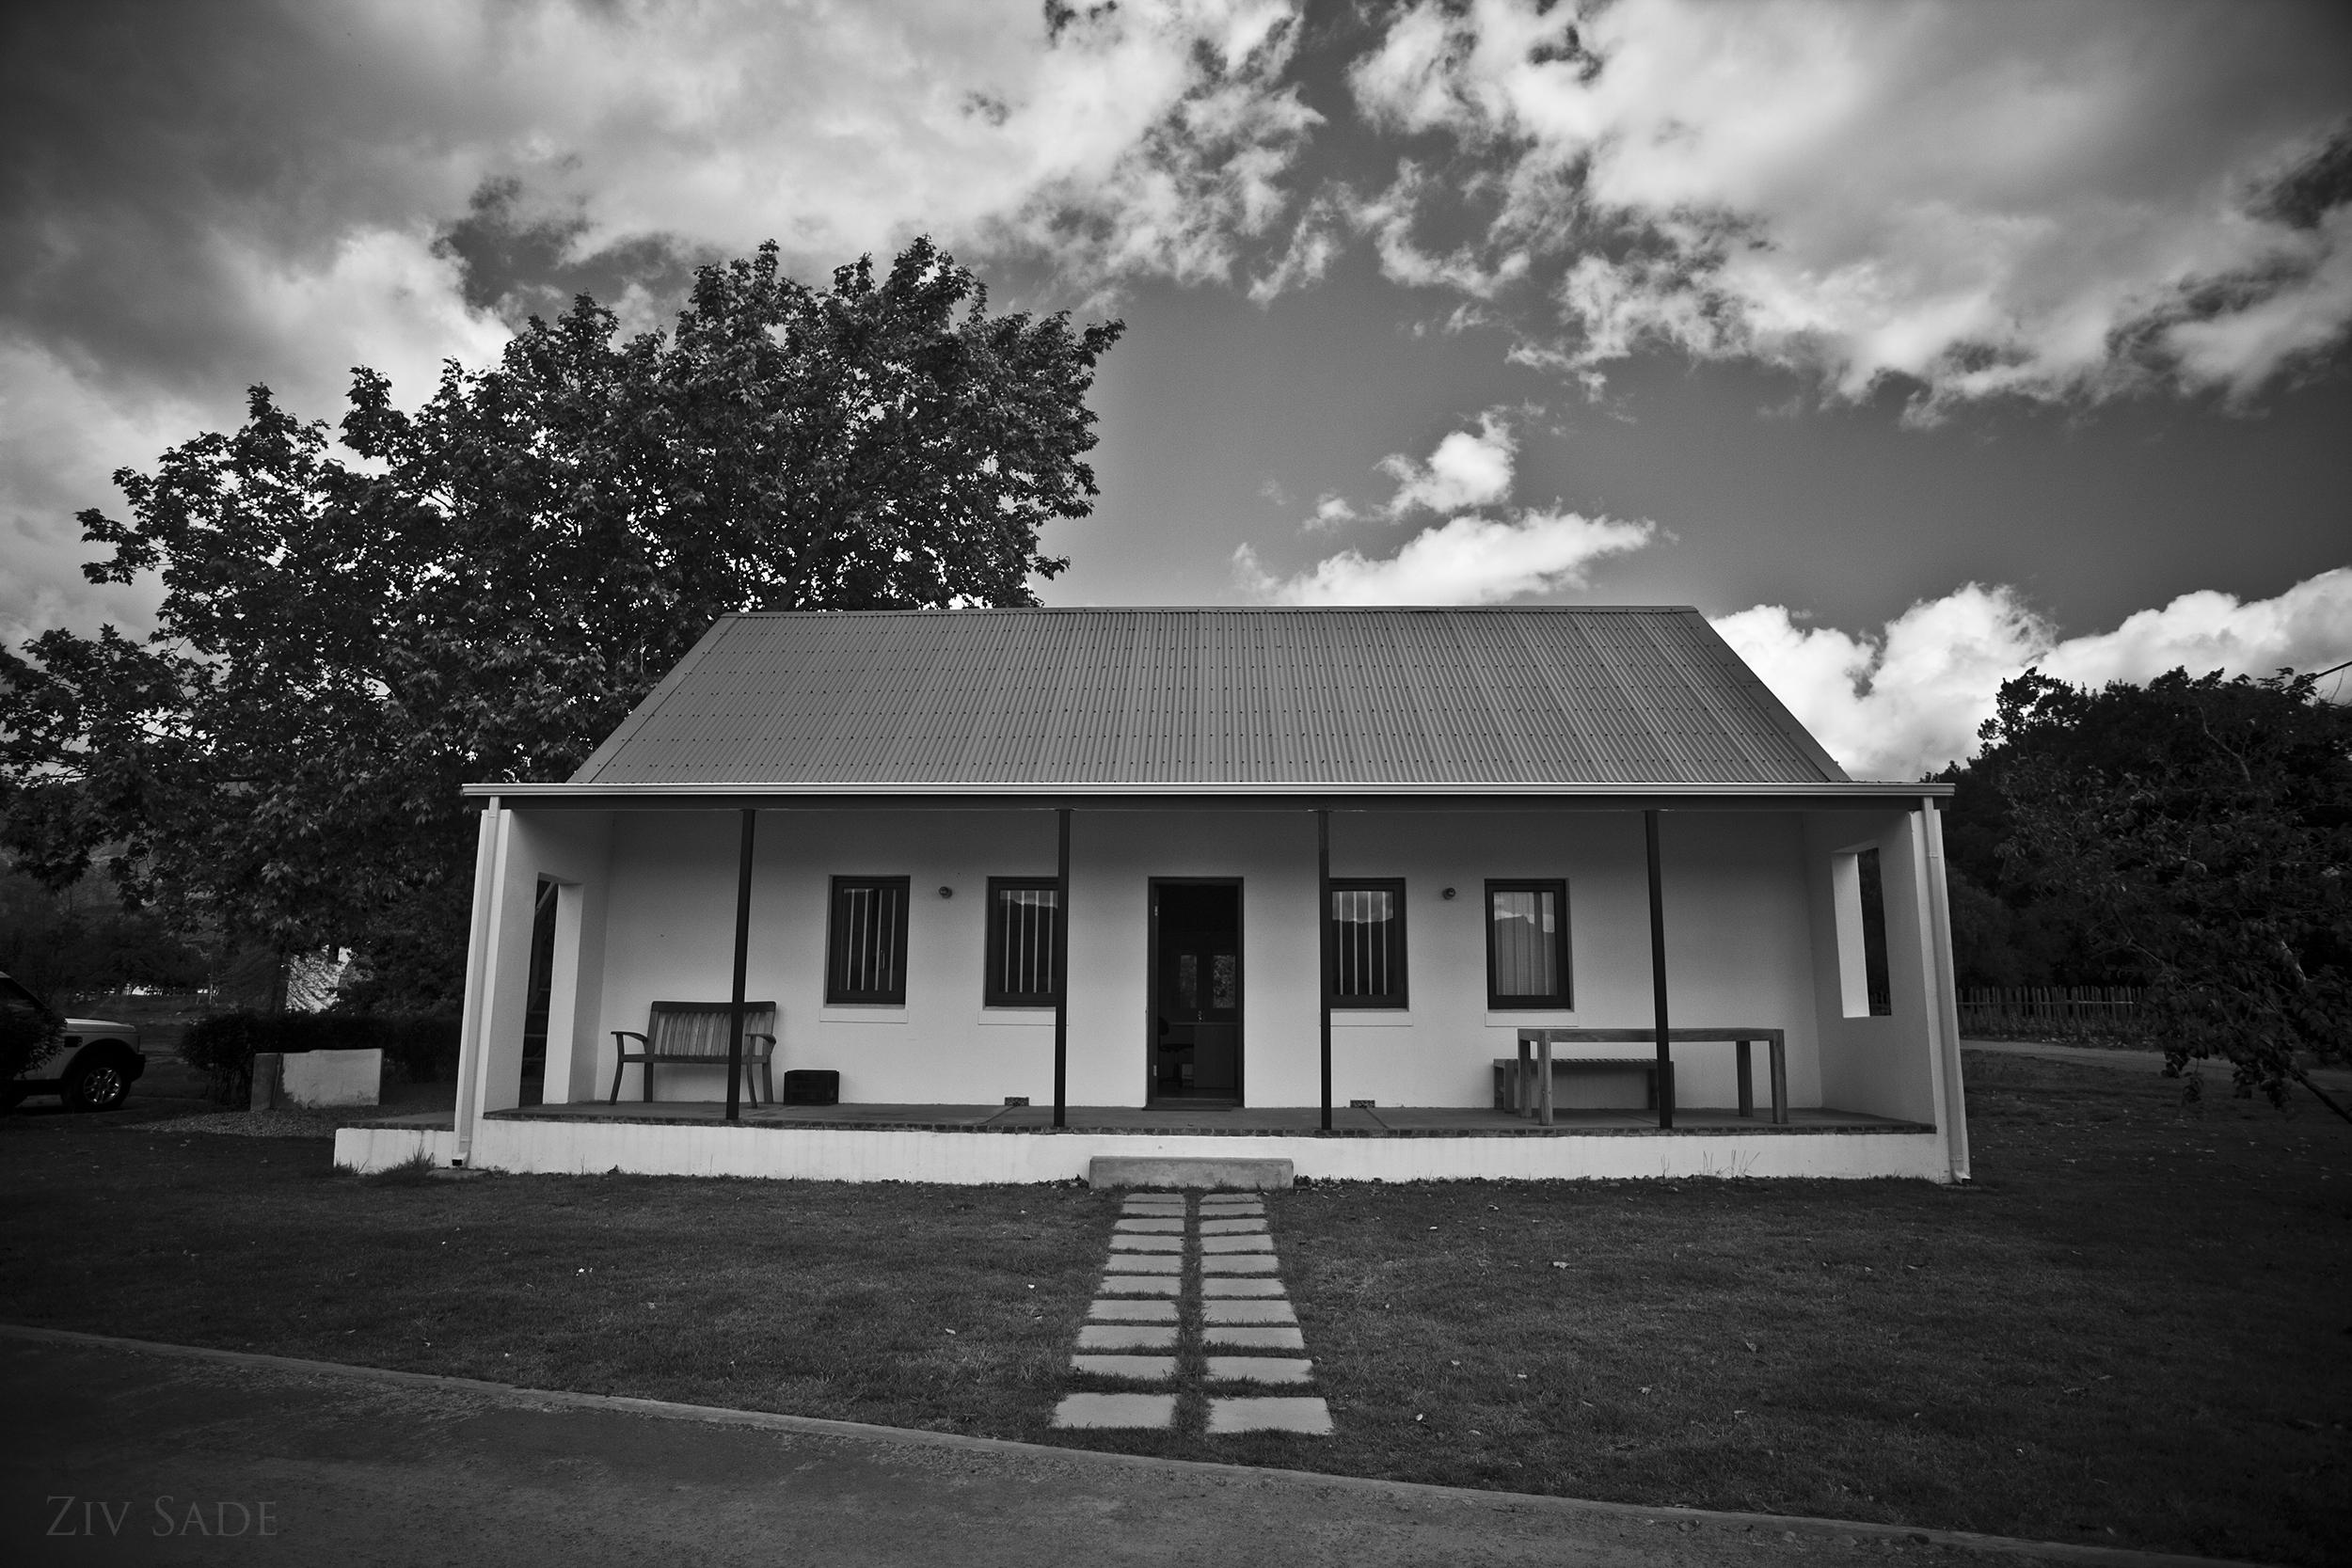 Stellenbosh 2013